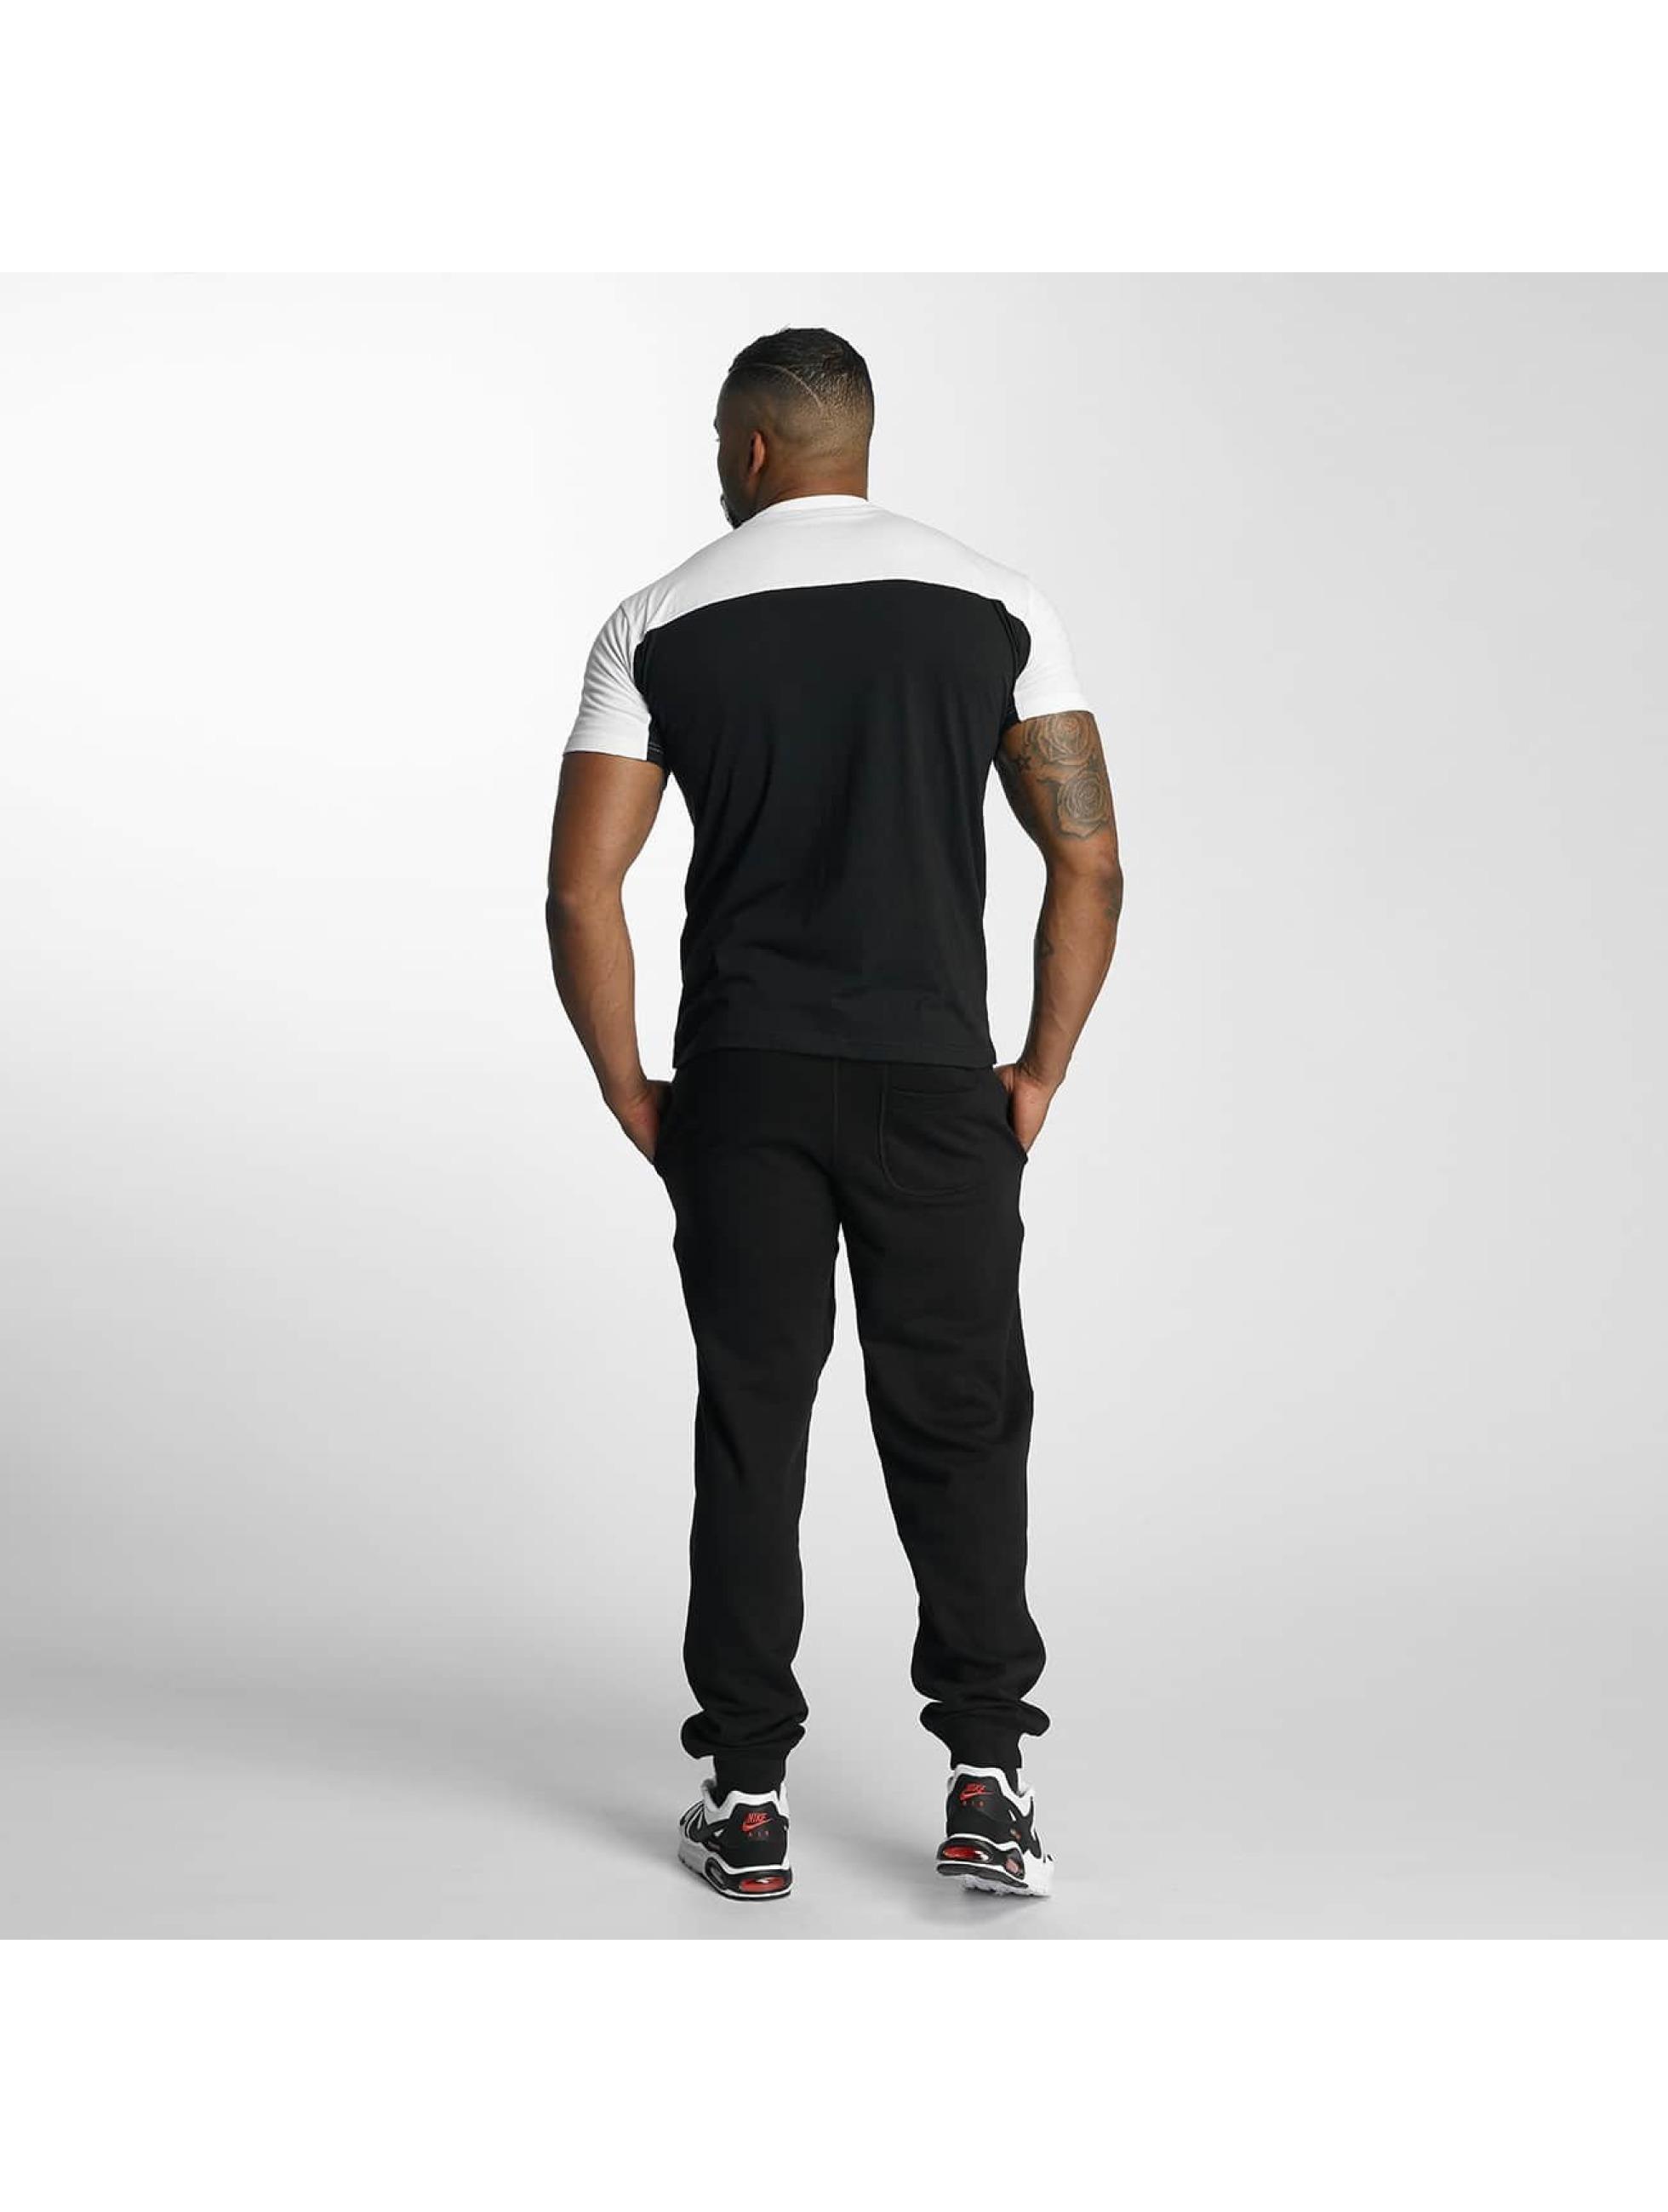 Pusher Apparel T-Shirt 137 Rio black